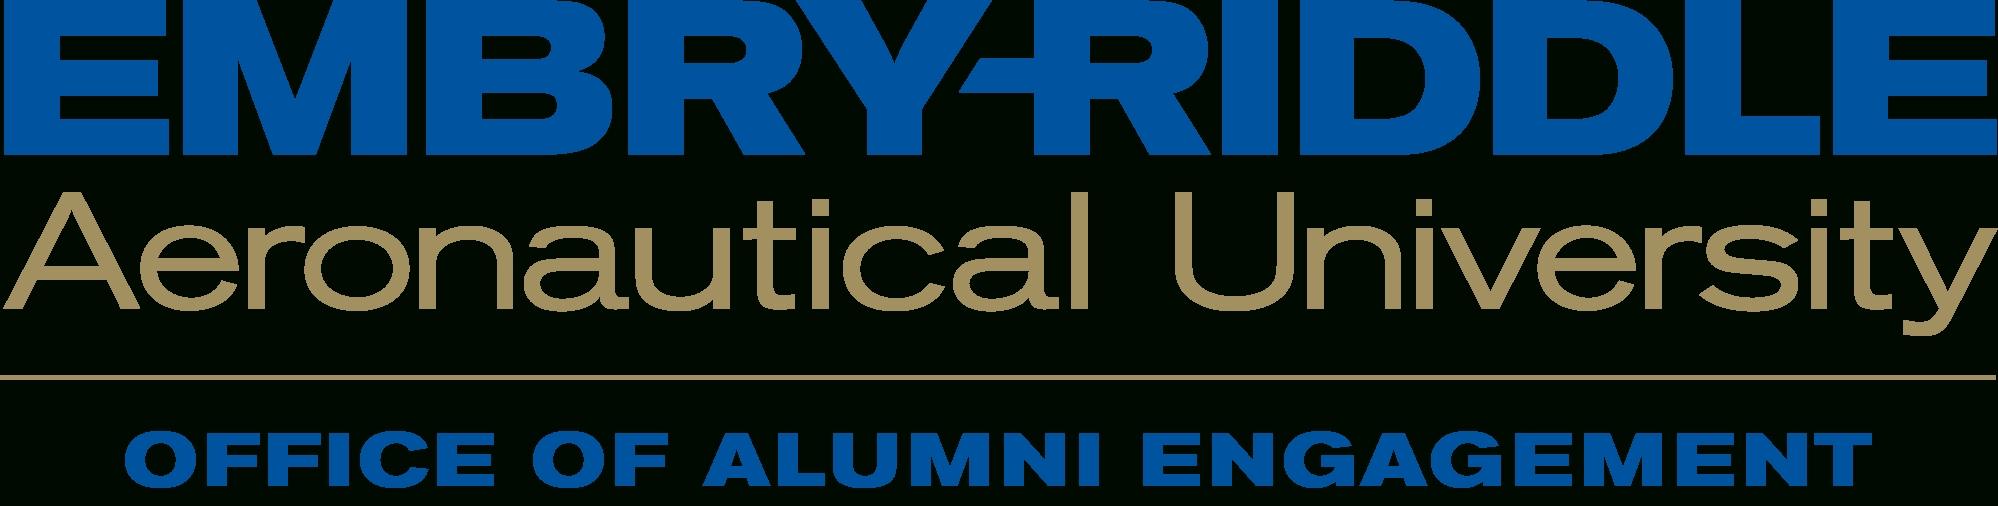 Embry-Riddle Office Of Alumni Engagement - Alumni